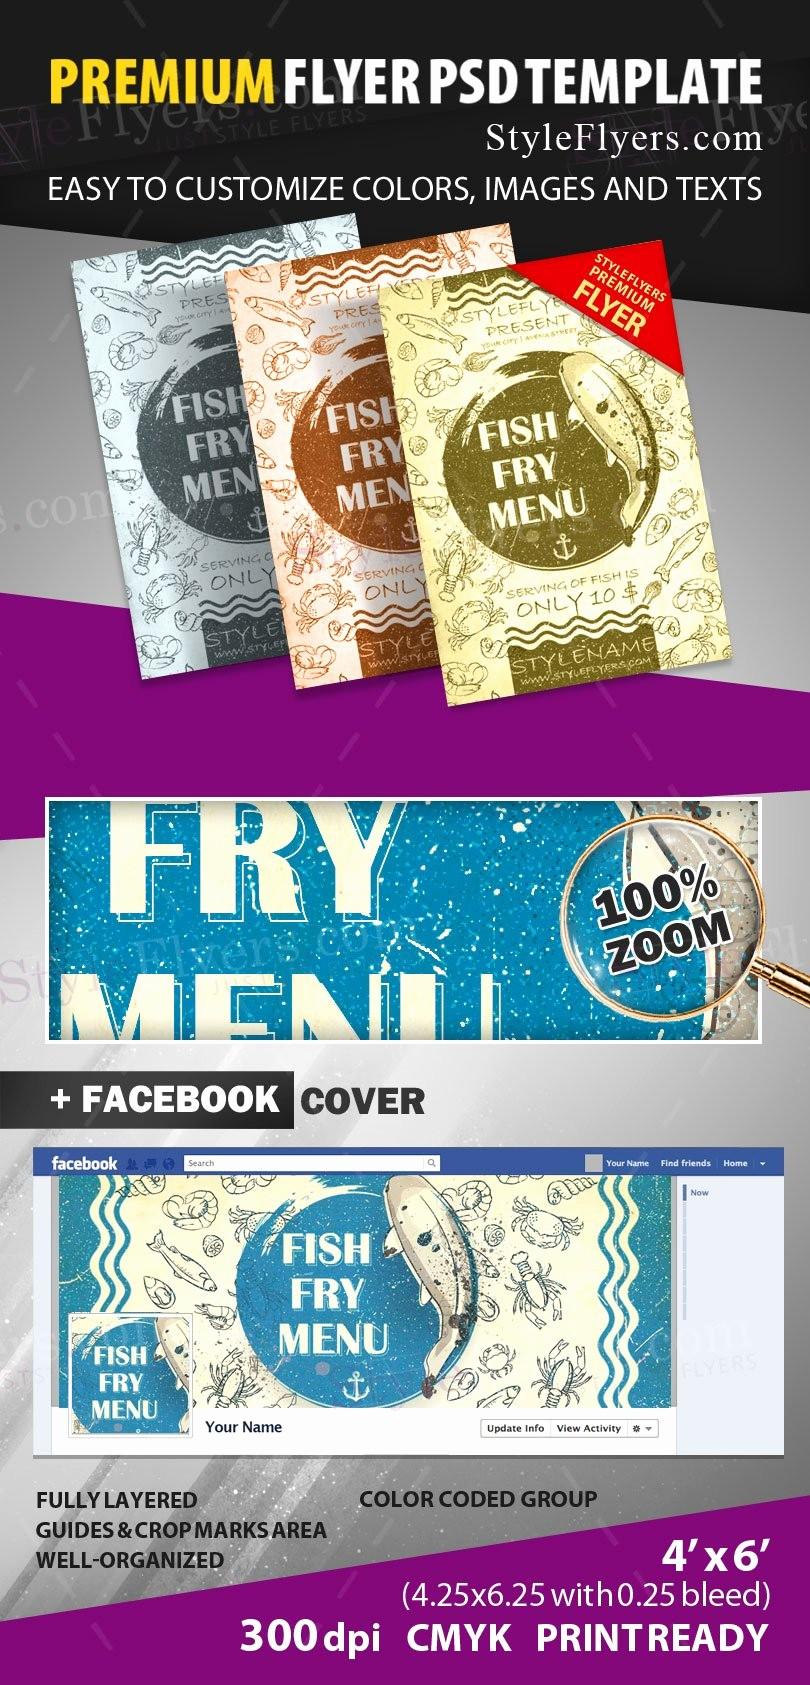 Free Fish Fry Flyer Templates Beautiful Fish Fry Menu Psd Flyer Template Styleflyers